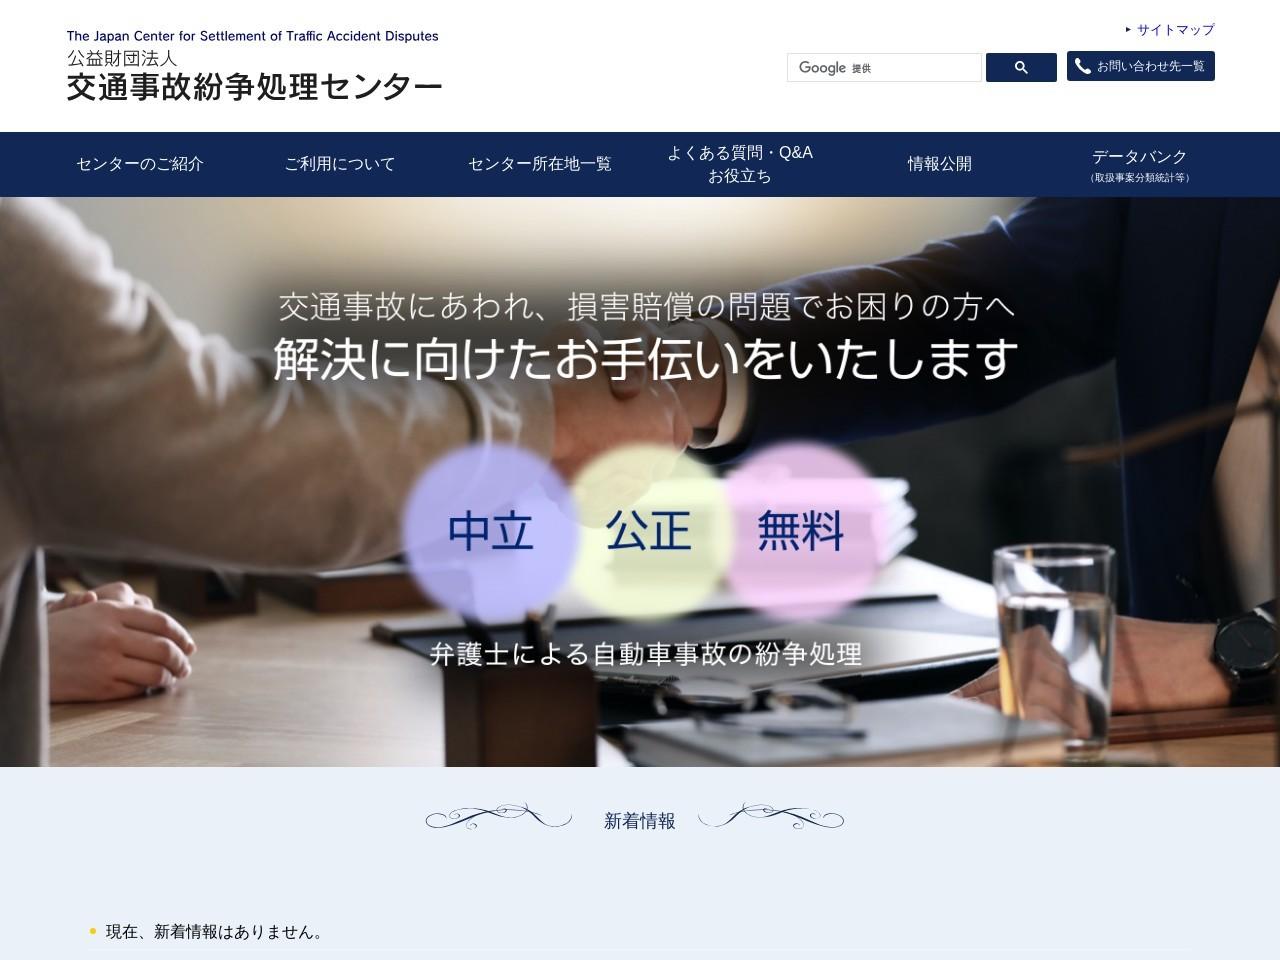 http://www.jcstad.or.jp/index.htm